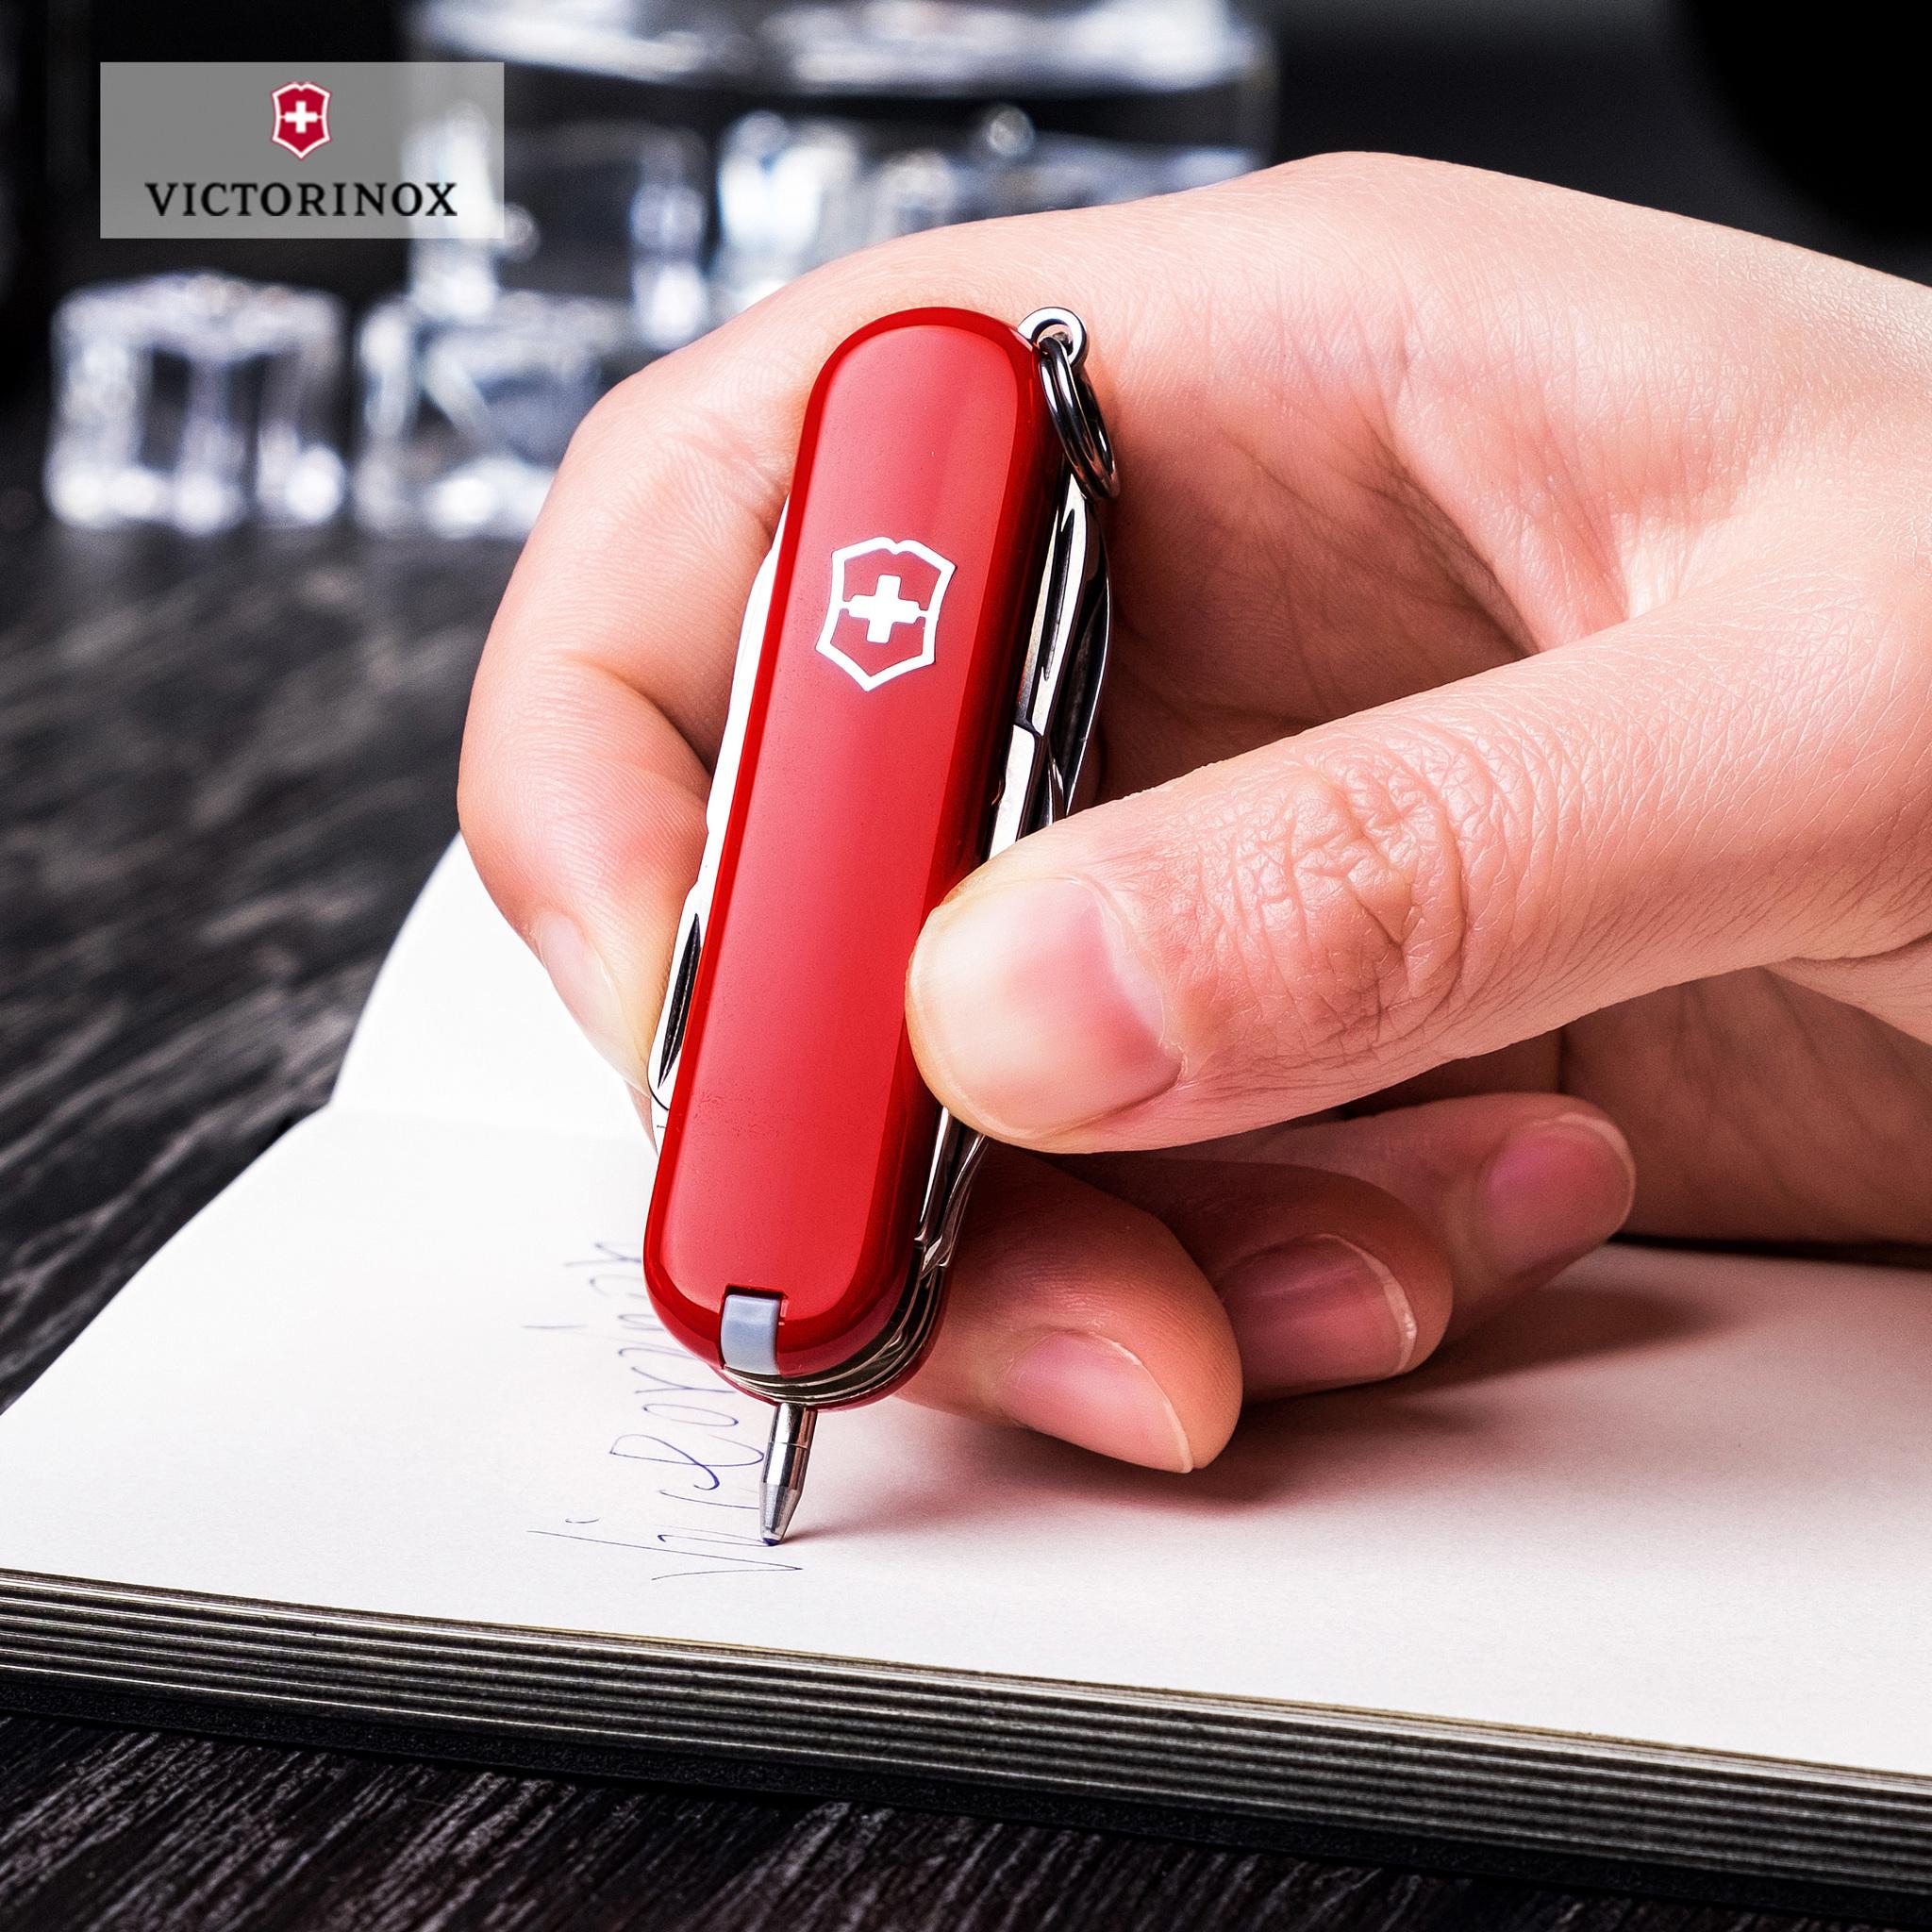 Нож-брелок Victorinox MiniChamp (0.6385) 58 мм. в сложенном виде, 16 функций - Wenger-Victorinox.Ru